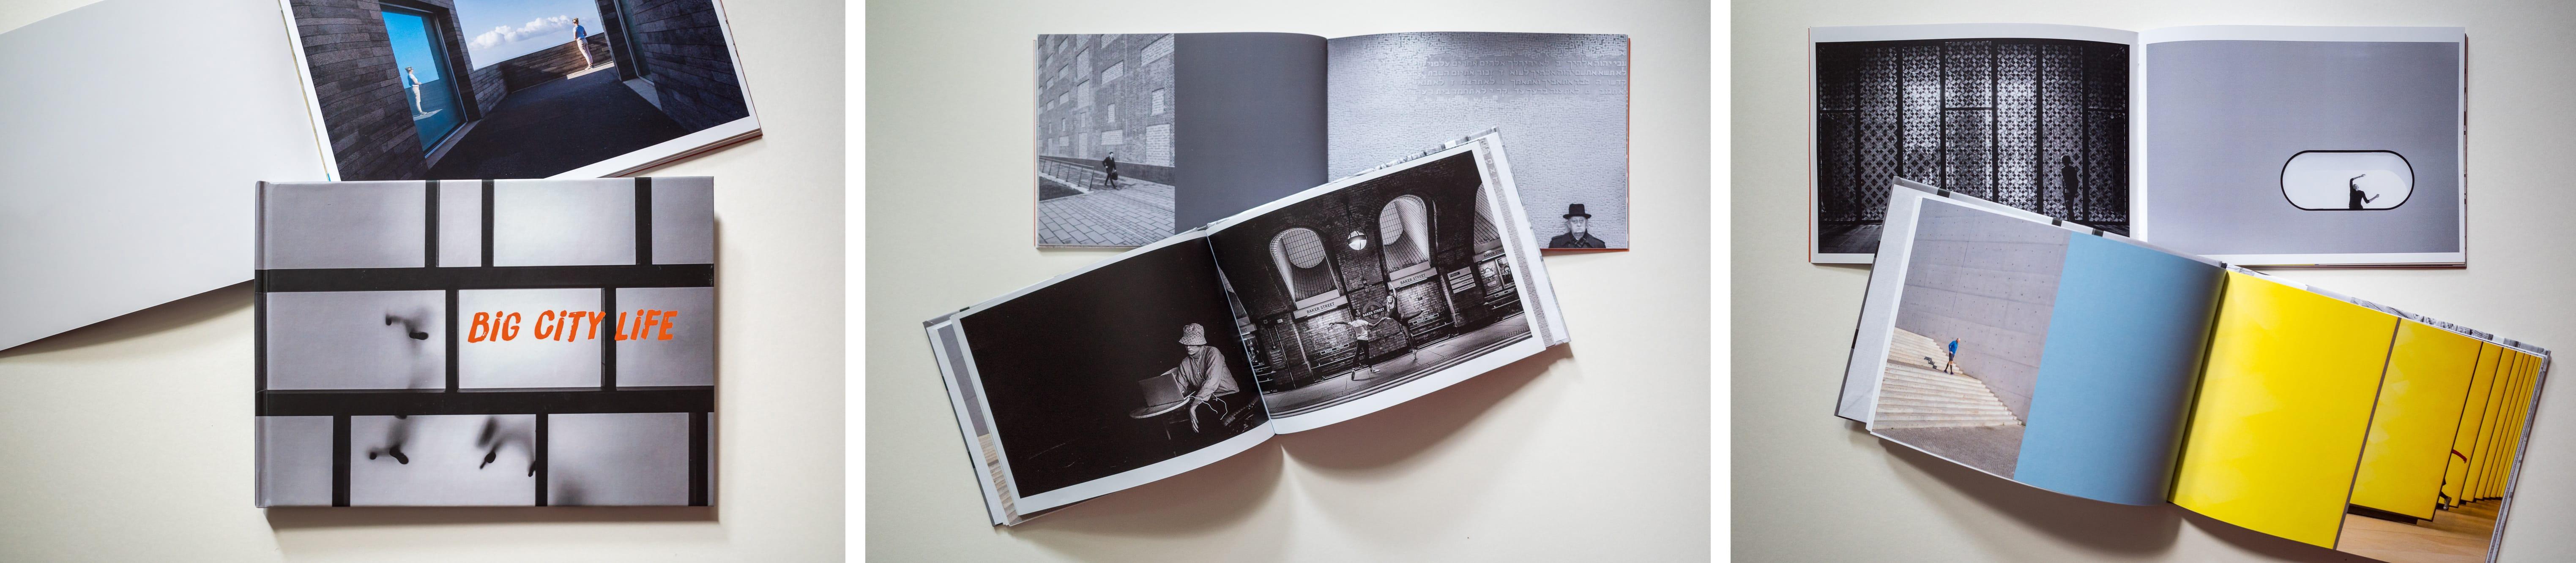 querformat-fotografie - Achim Katzberg - Besondere Zeiten - besondere Aktivitäten - querformat-fotografie_BiG_CiTY_LiFE_neu-Collage